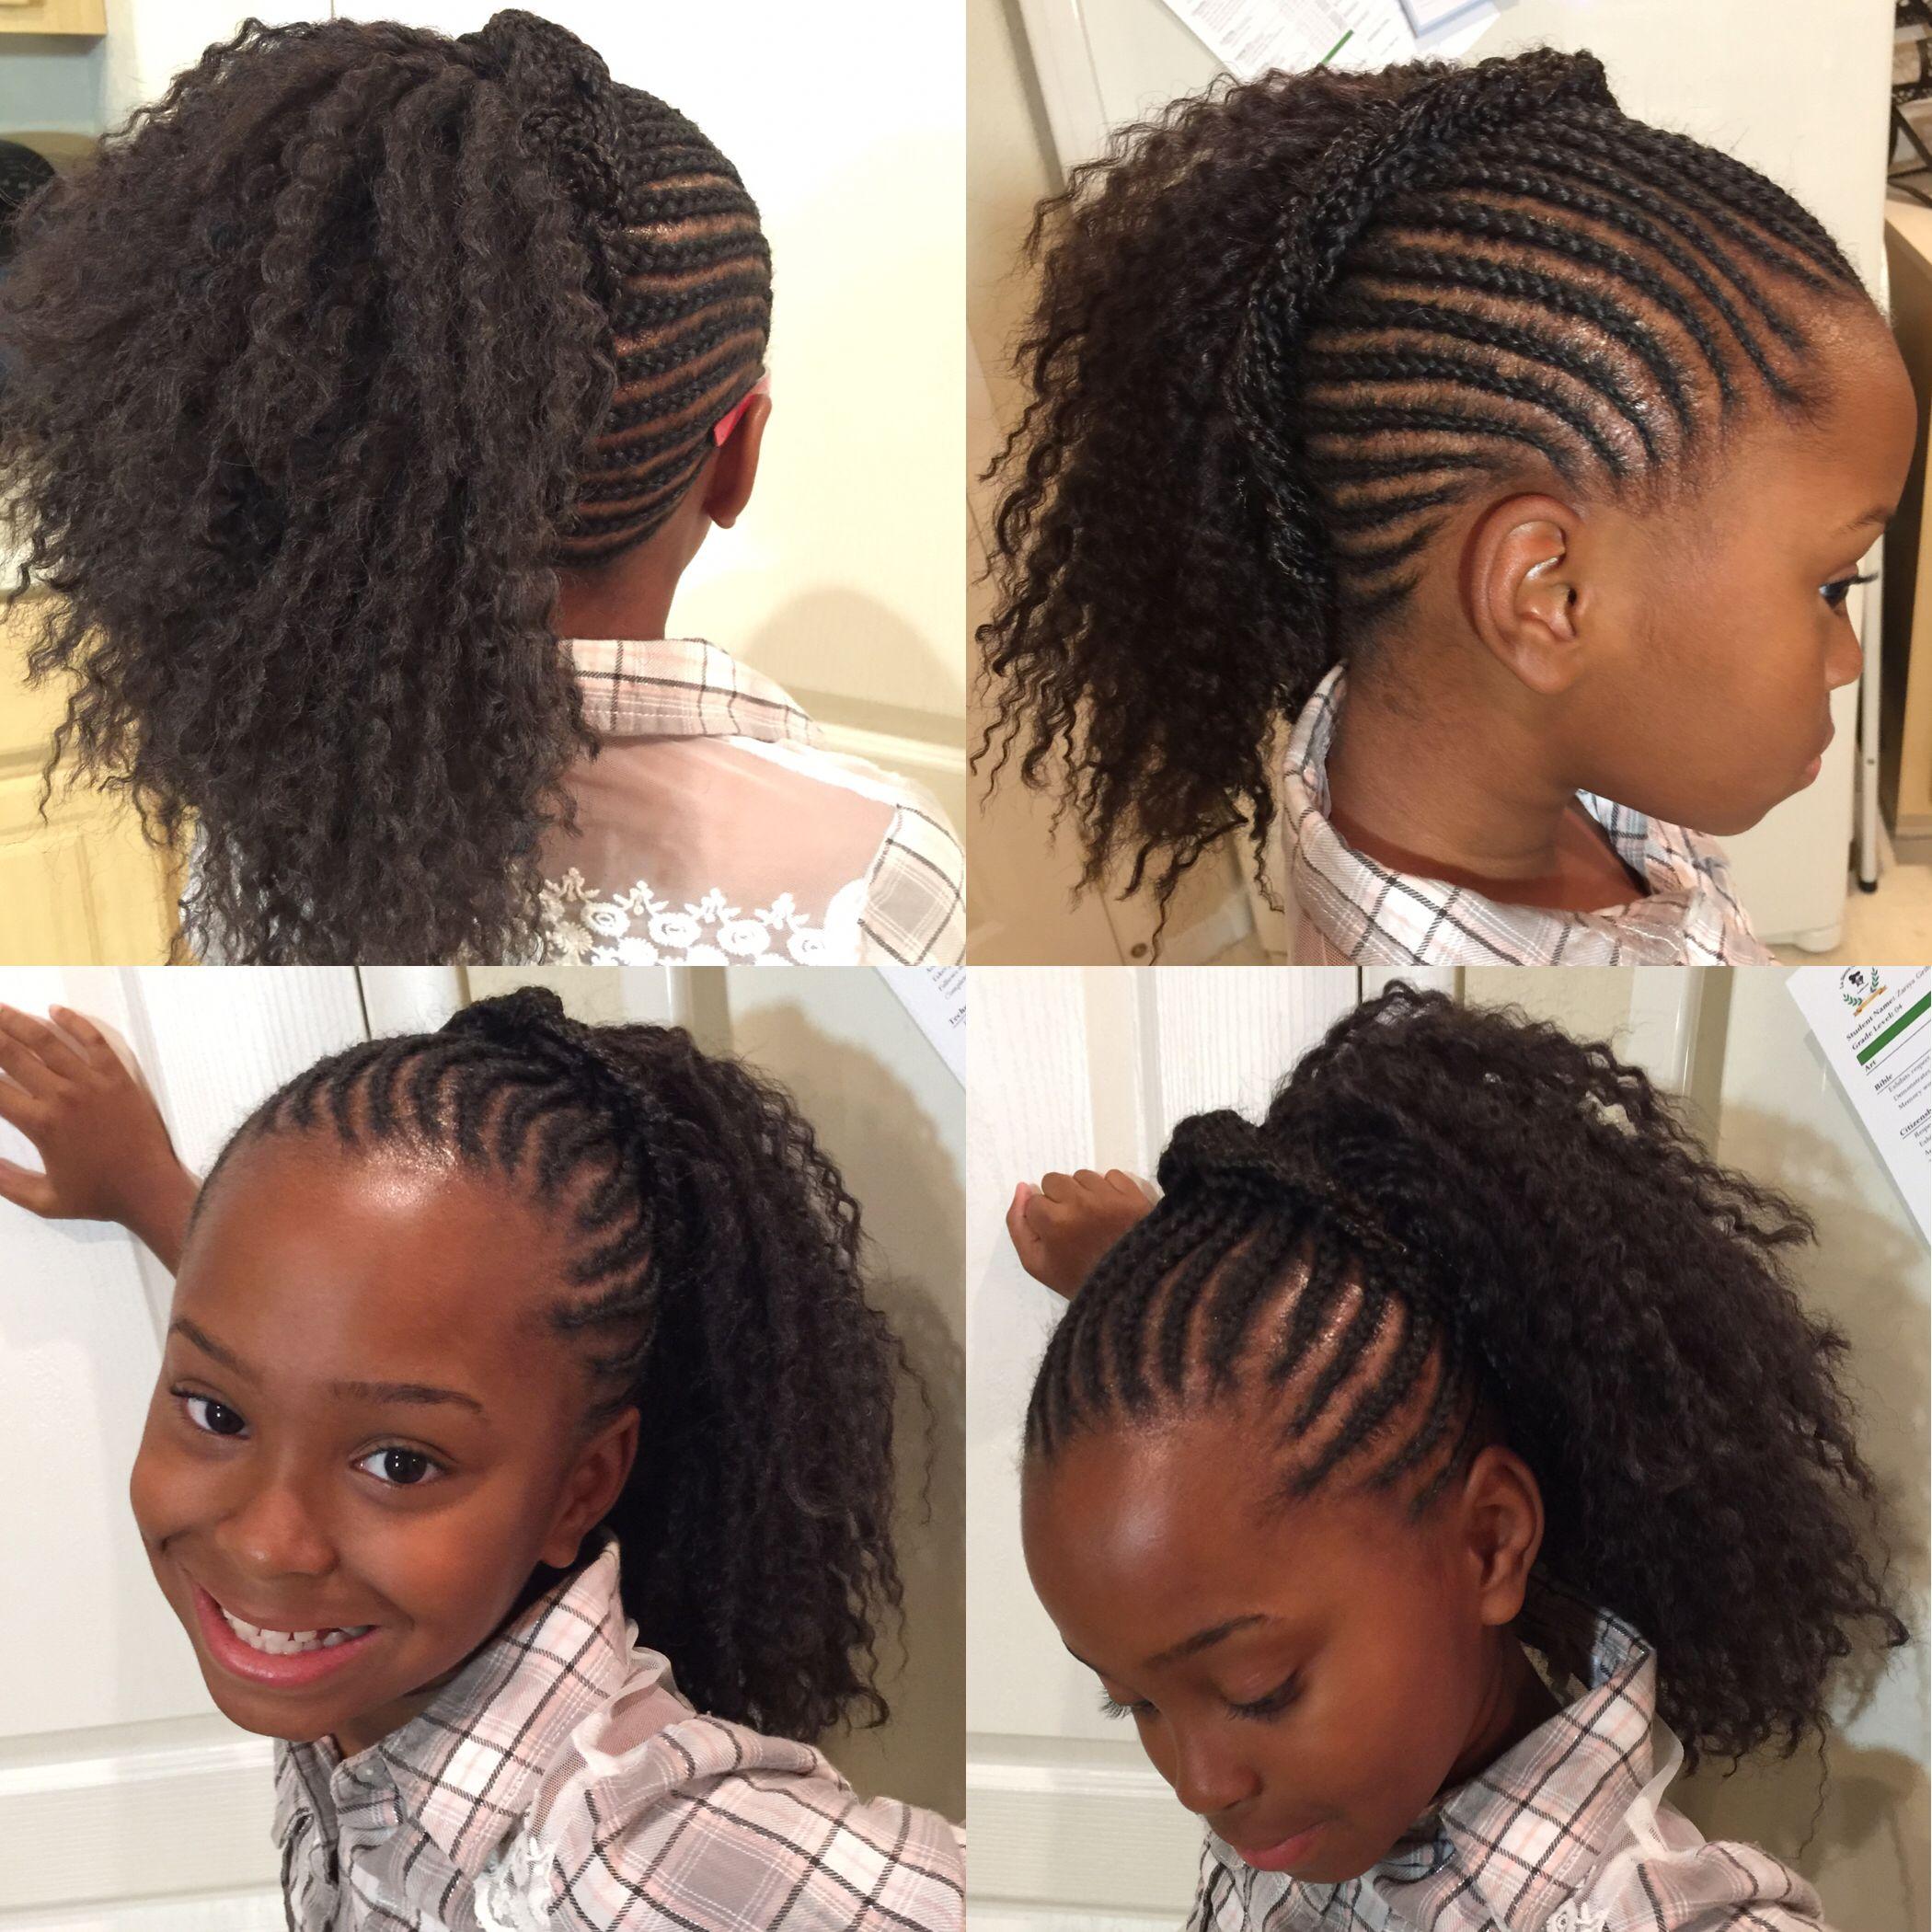 crochet braids, cornrows, french braids, little girl hair, black